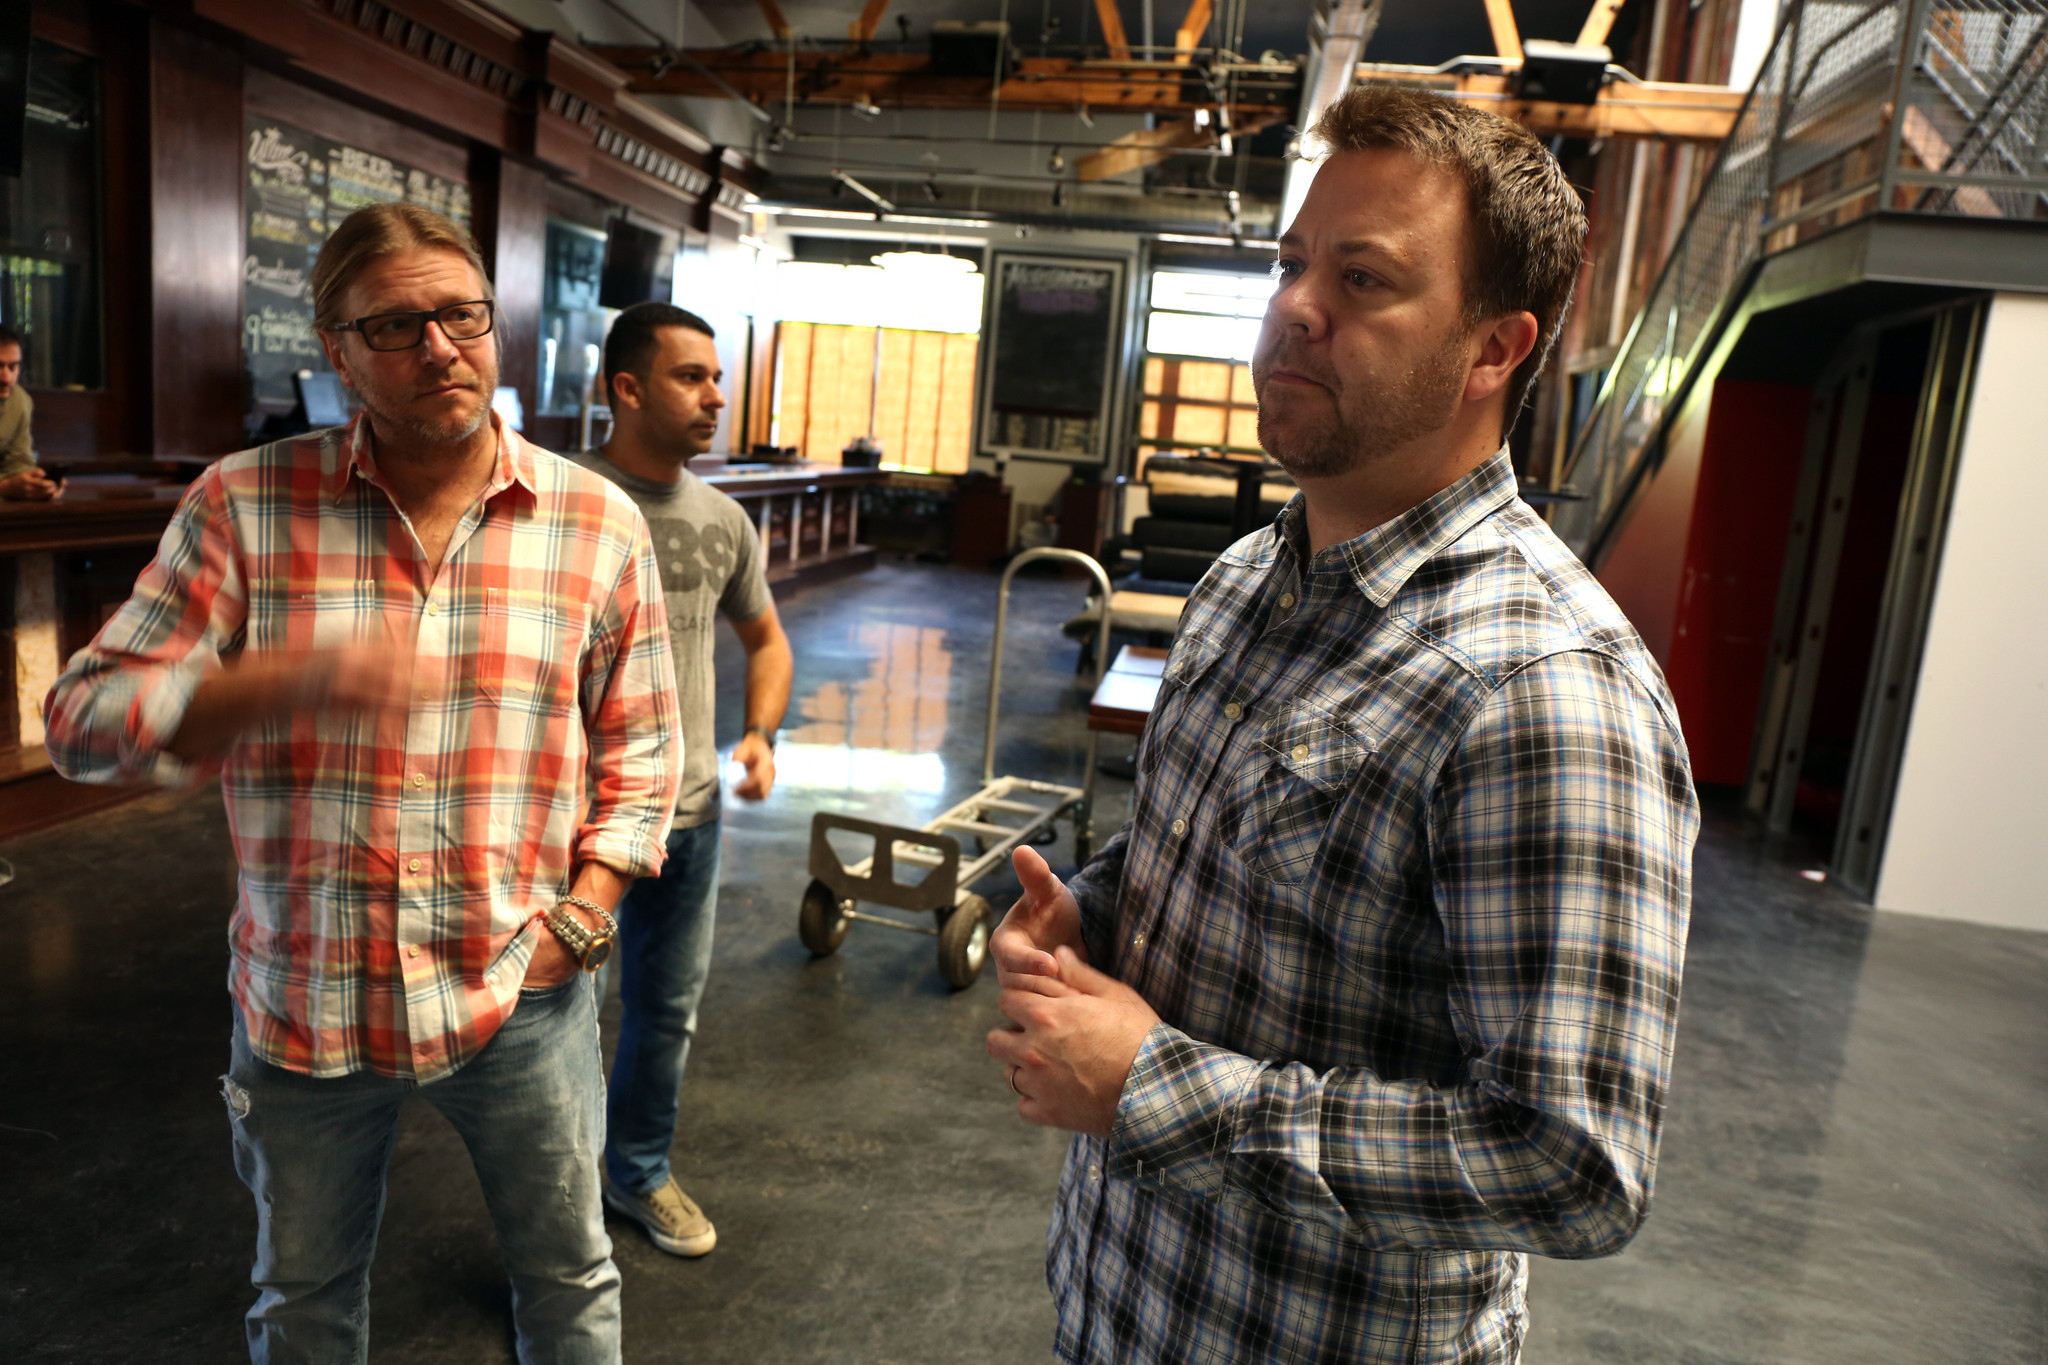 Finch's Beer recasts itself with acquisitions of Breakroom, Hopothesis